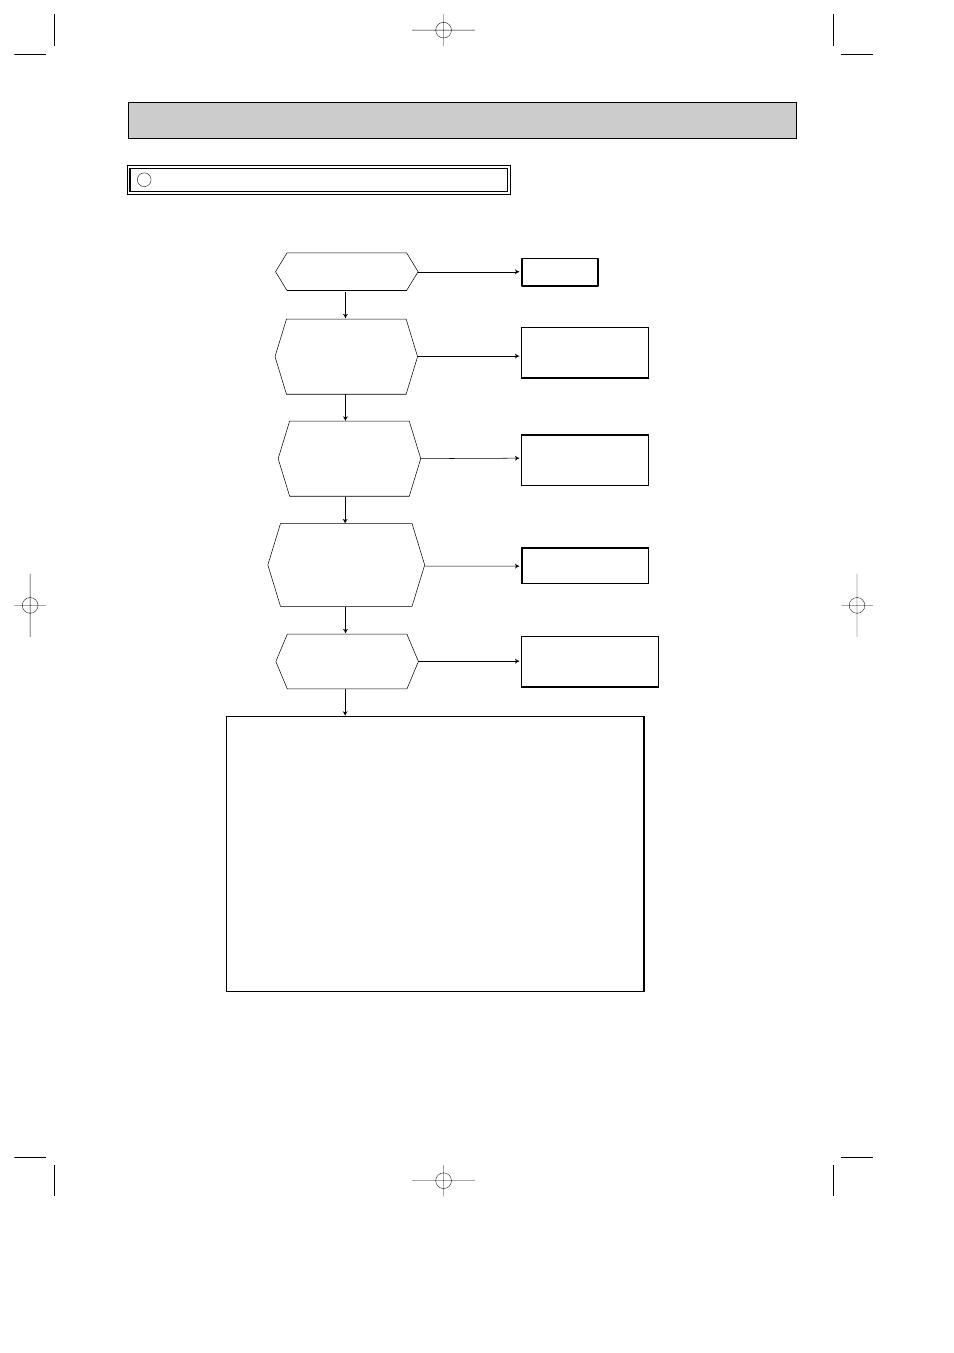 Mitsubishi Electric Msz Fa35va User Manual Page 29 40 Original Wiring Diagram